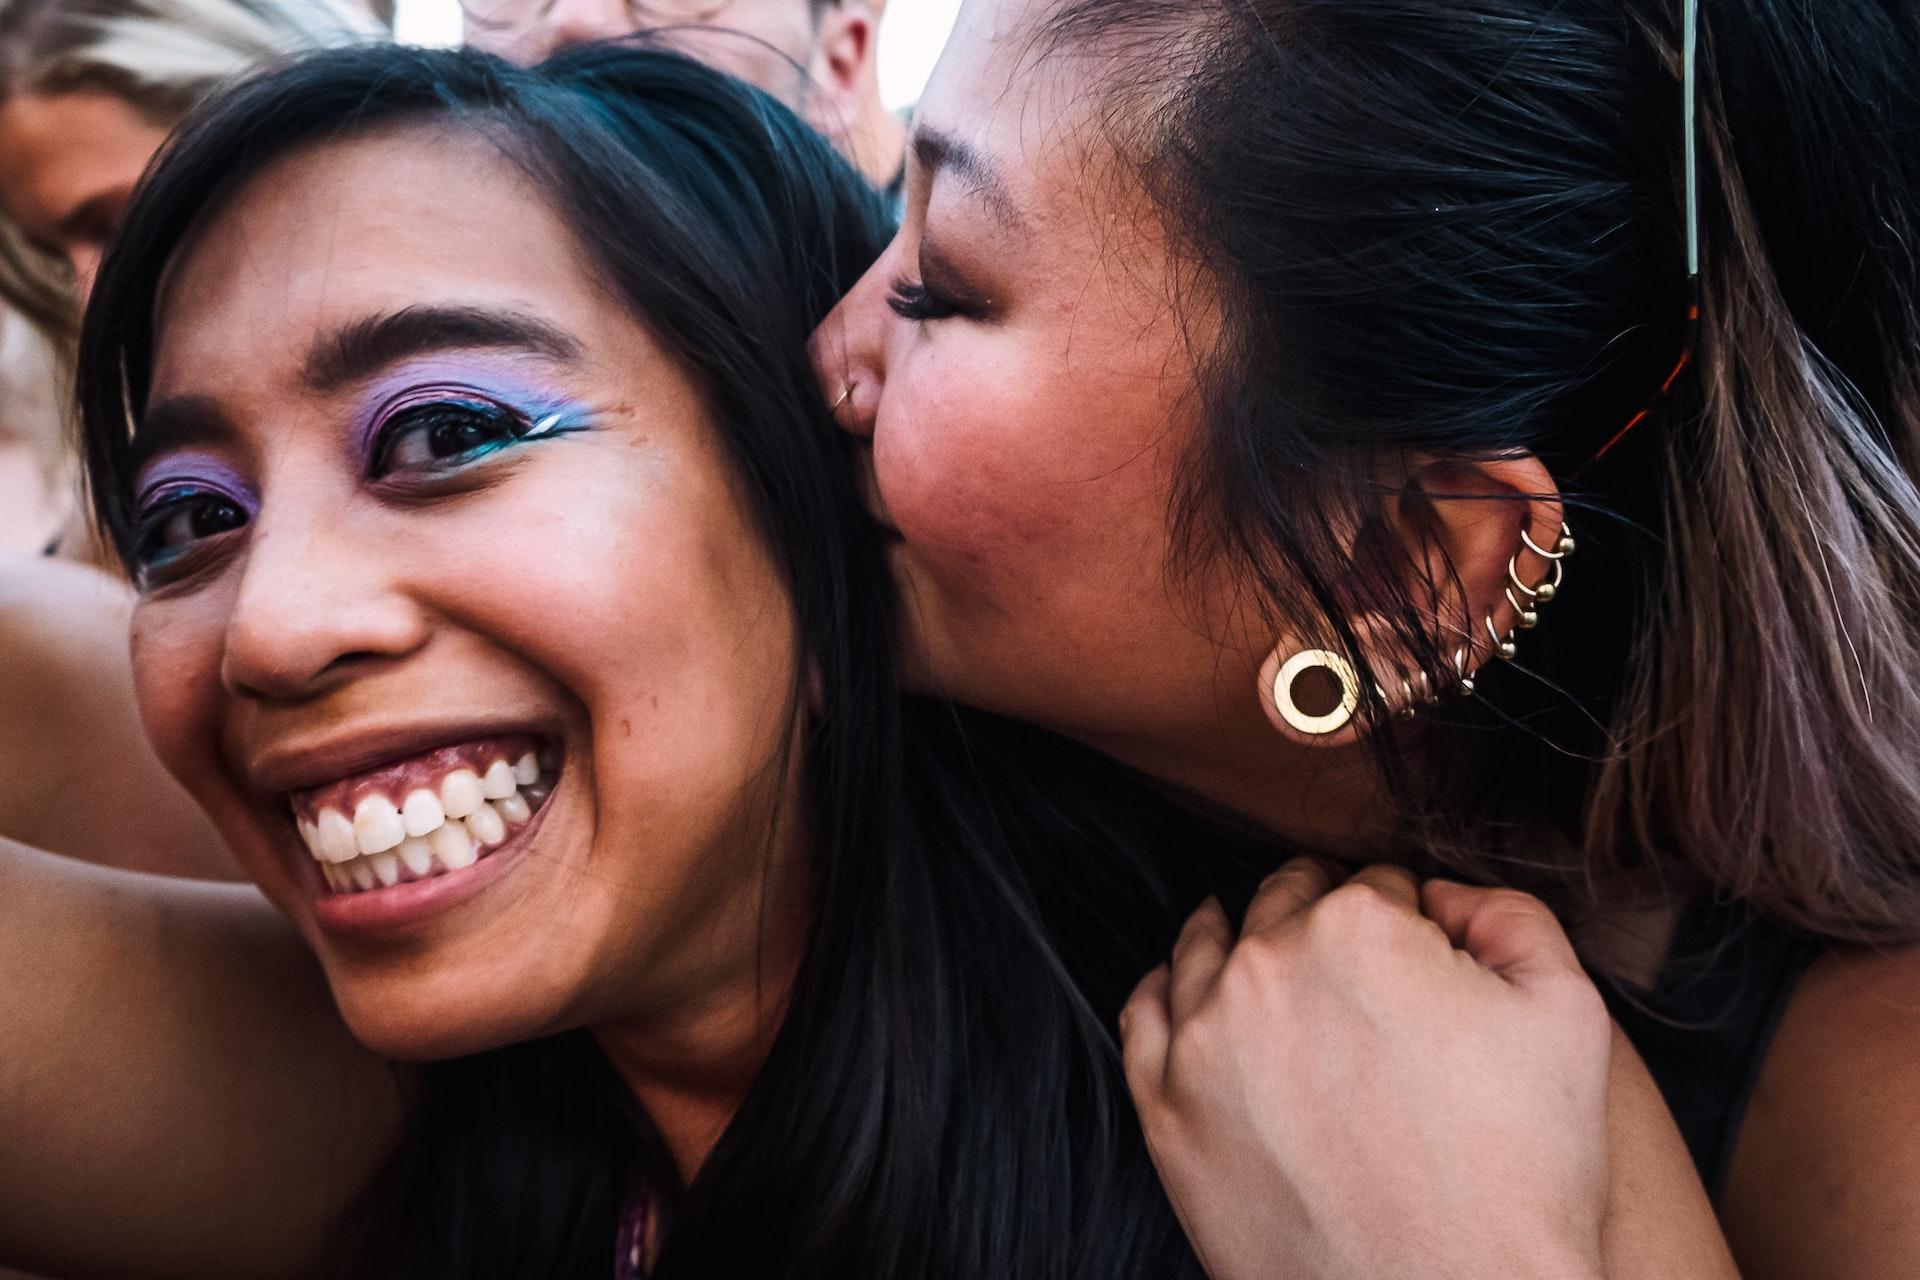 Dour 2019 © Vanessa COQUELLE aka @darthbrijit - Public jour - 1